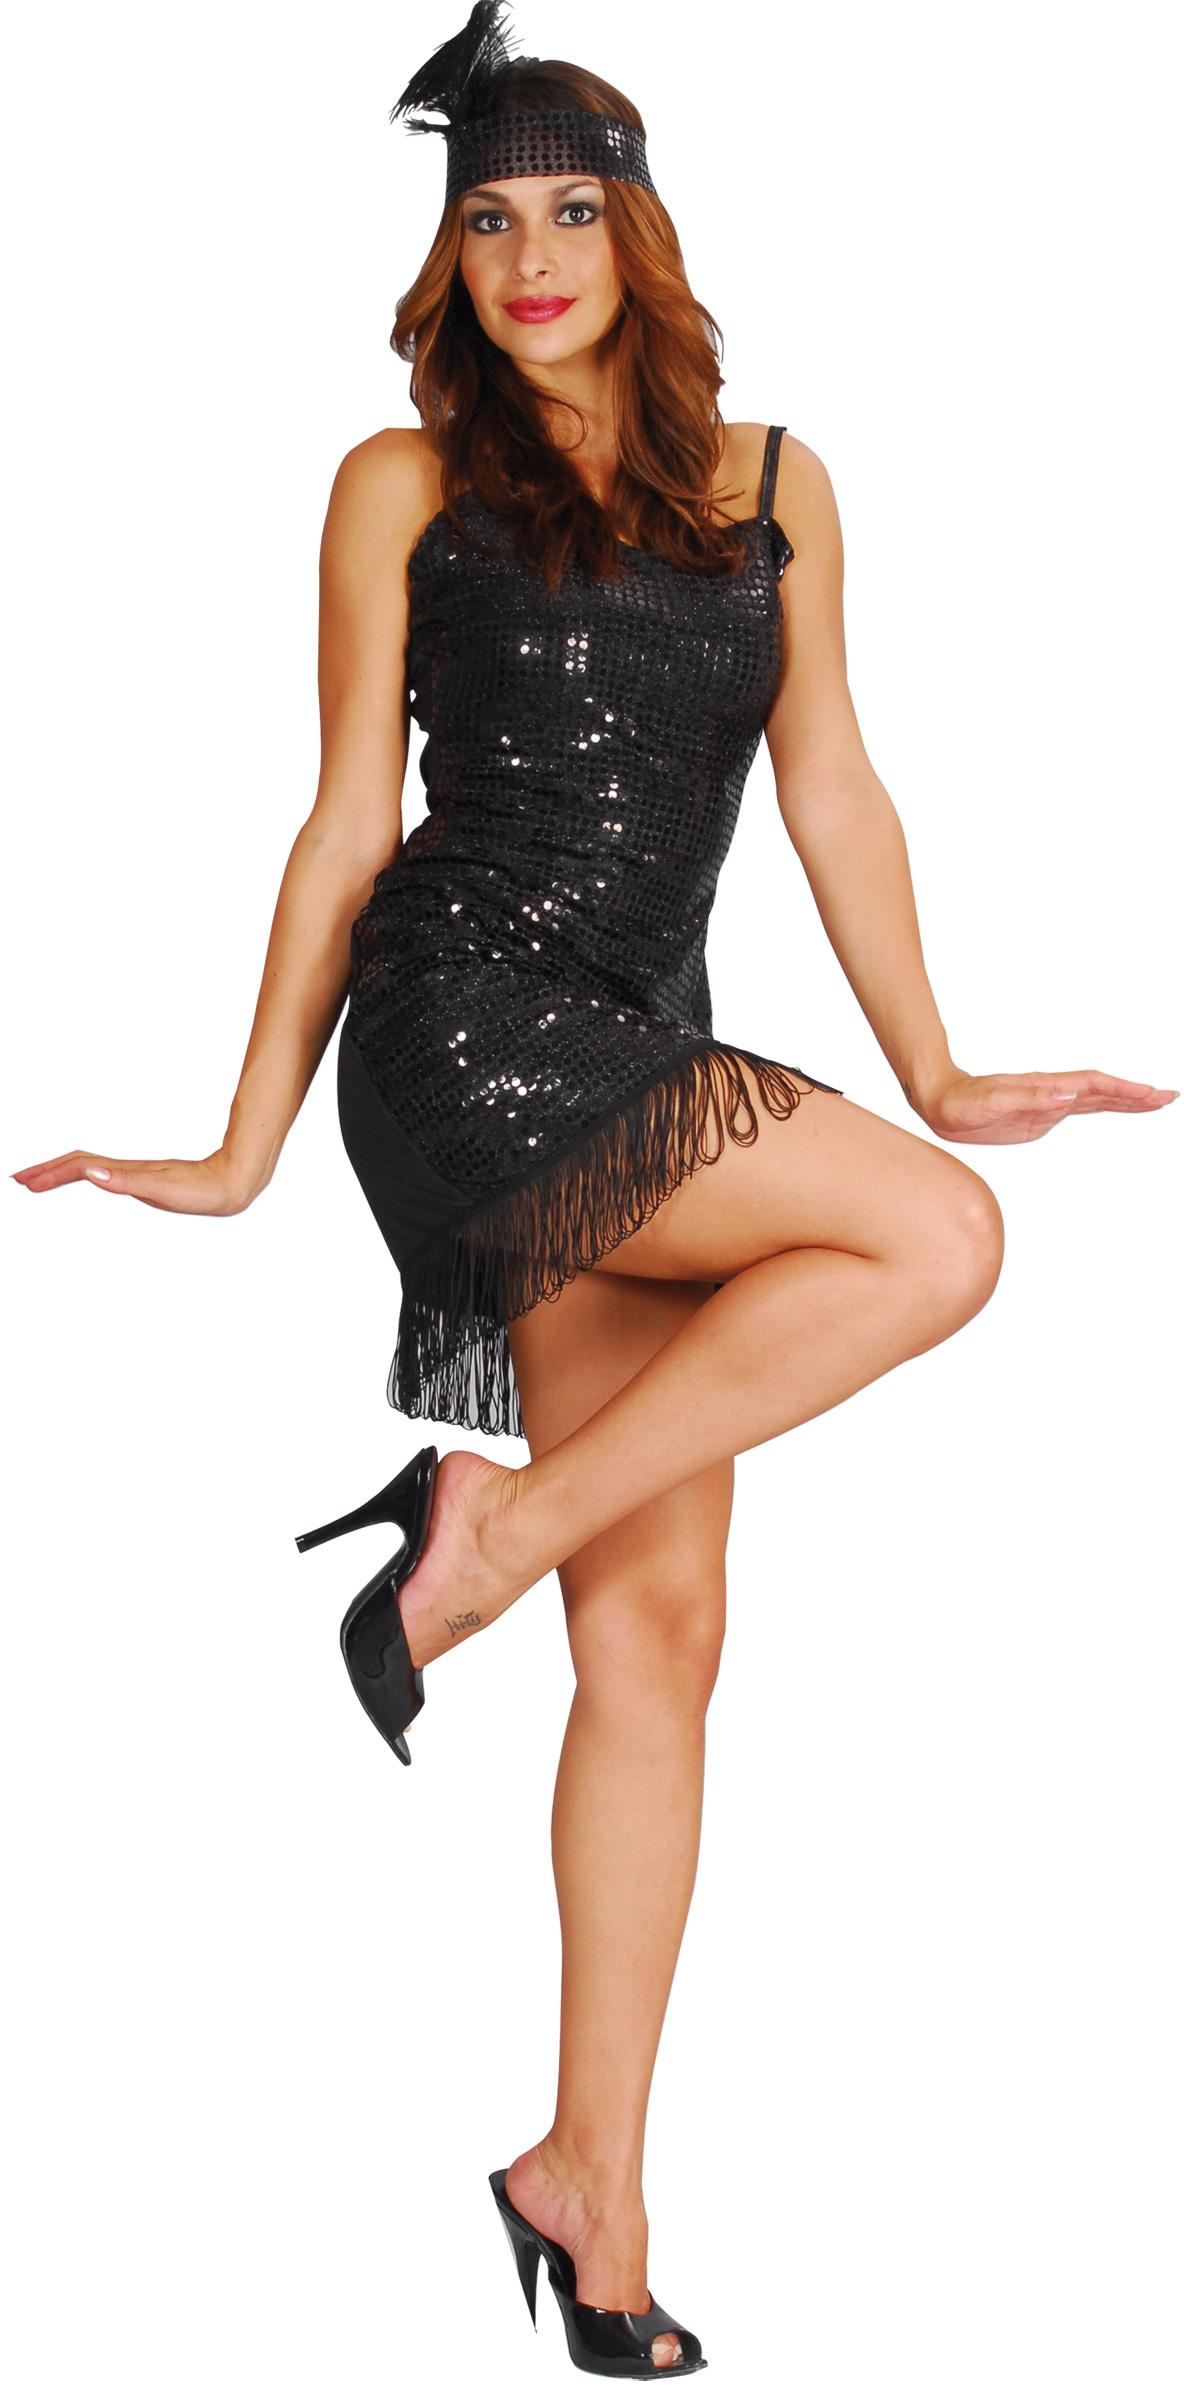 d guisement charleston femme robe ann e 20 sequins. Black Bedroom Furniture Sets. Home Design Ideas